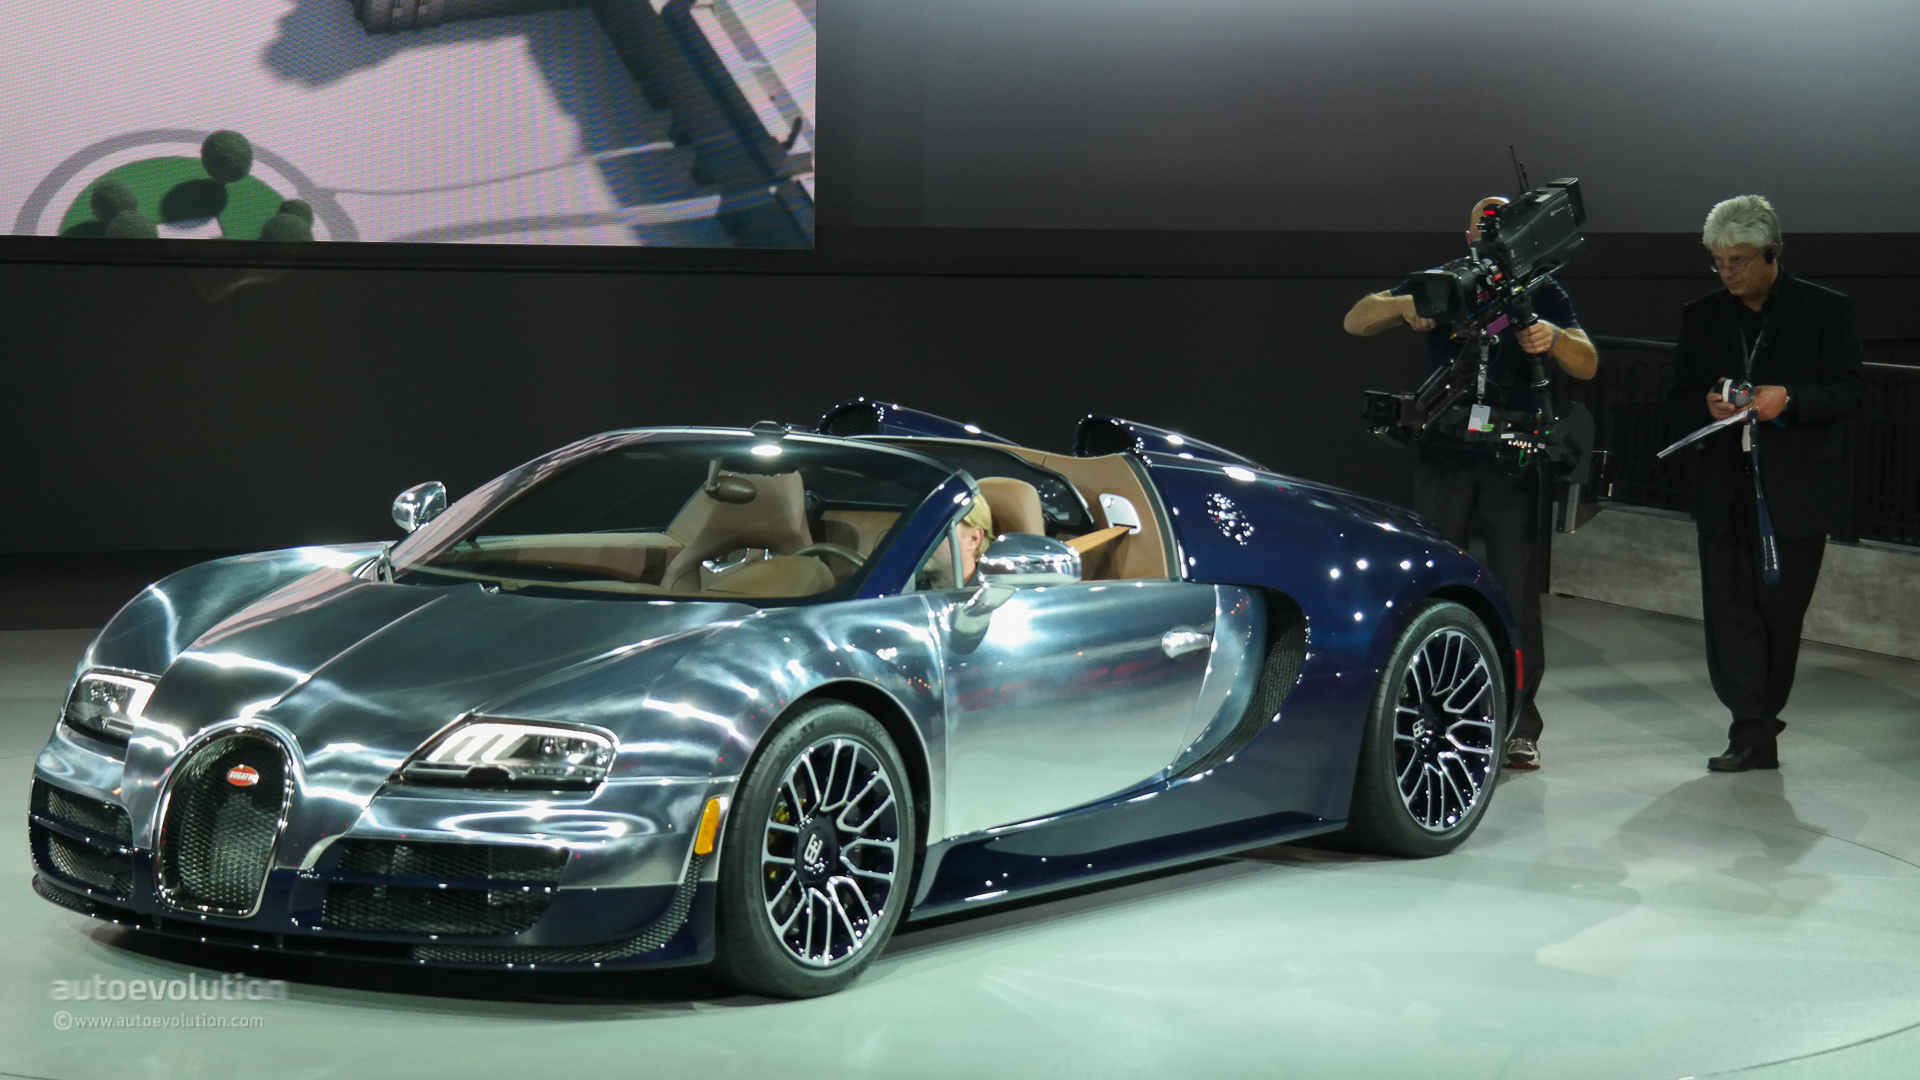 بالصور احدث صور سيارات , اجمل صور للسيارات 3498 8